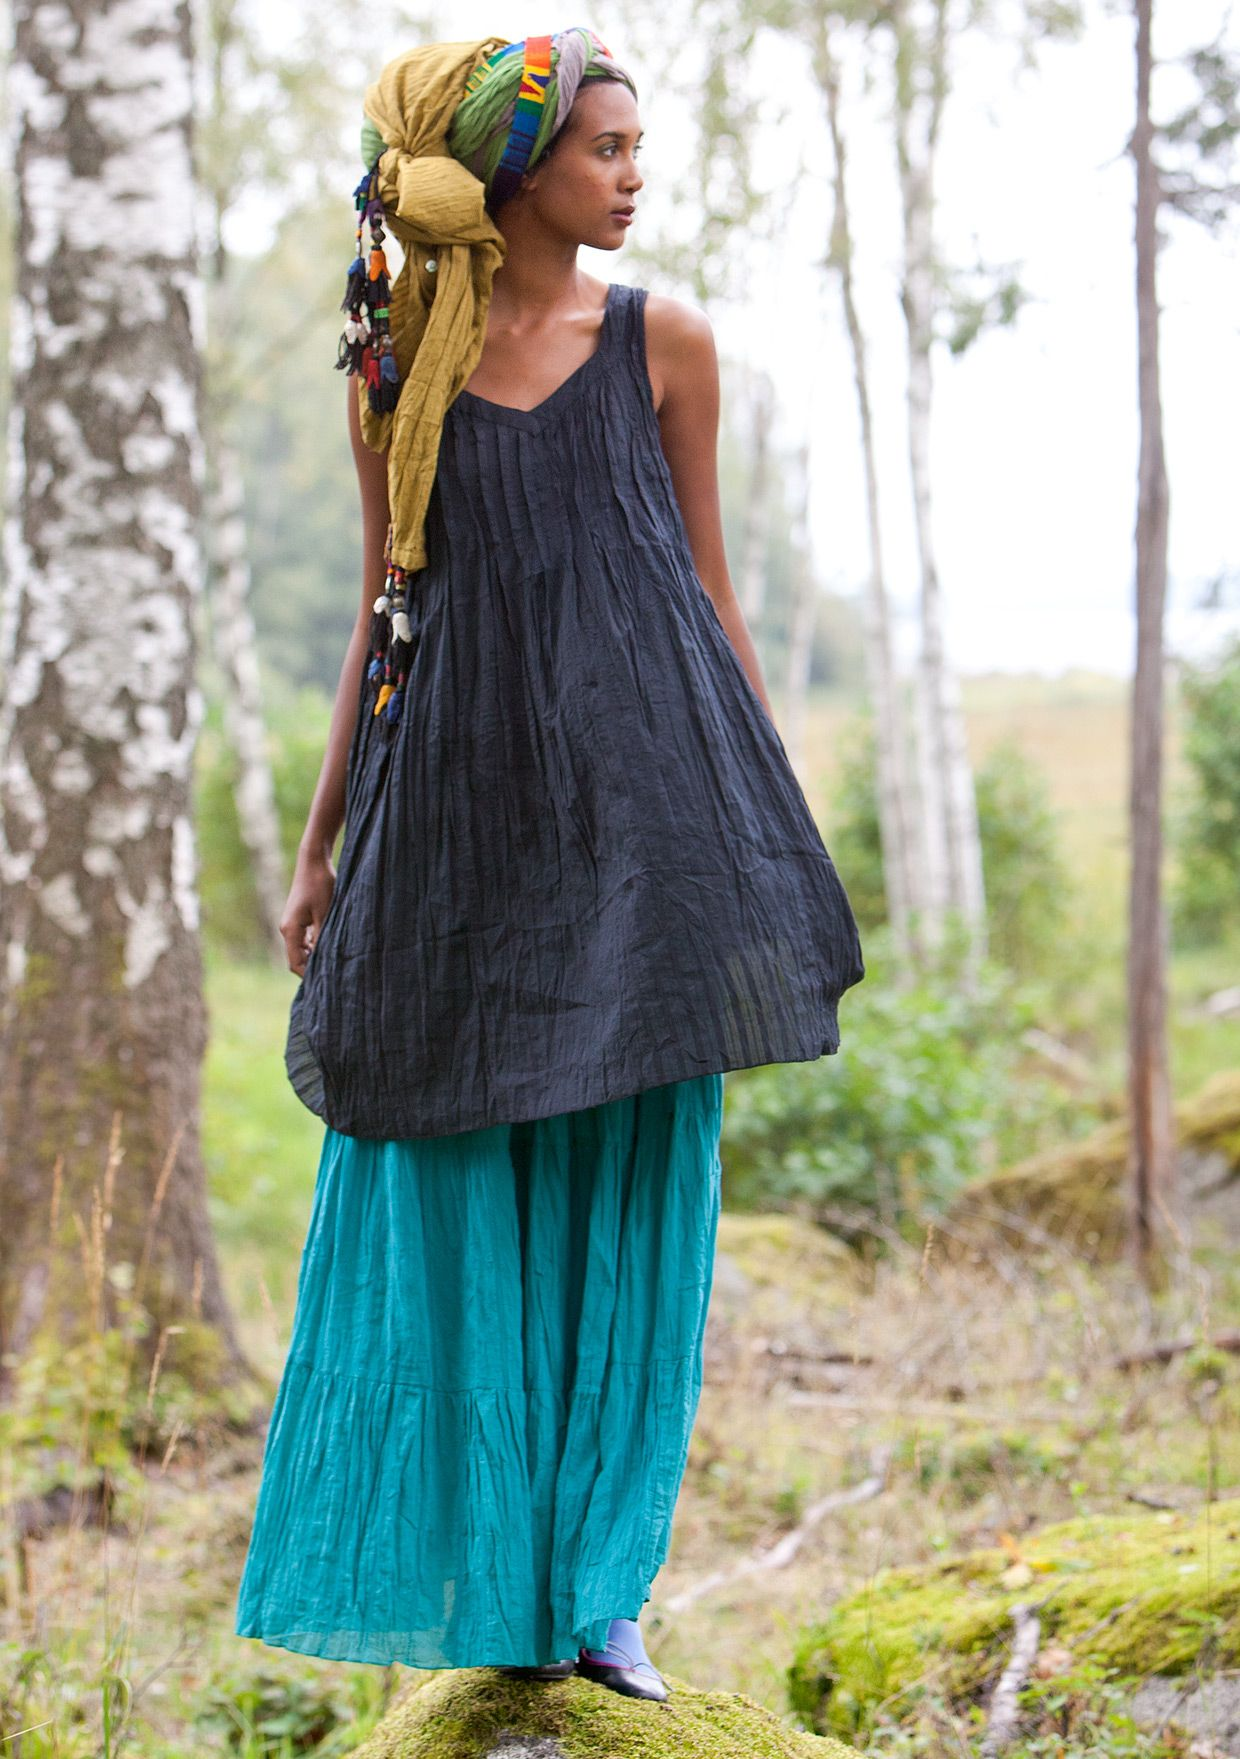 BoHo Gently crinkled ecocotton skirt, it's the